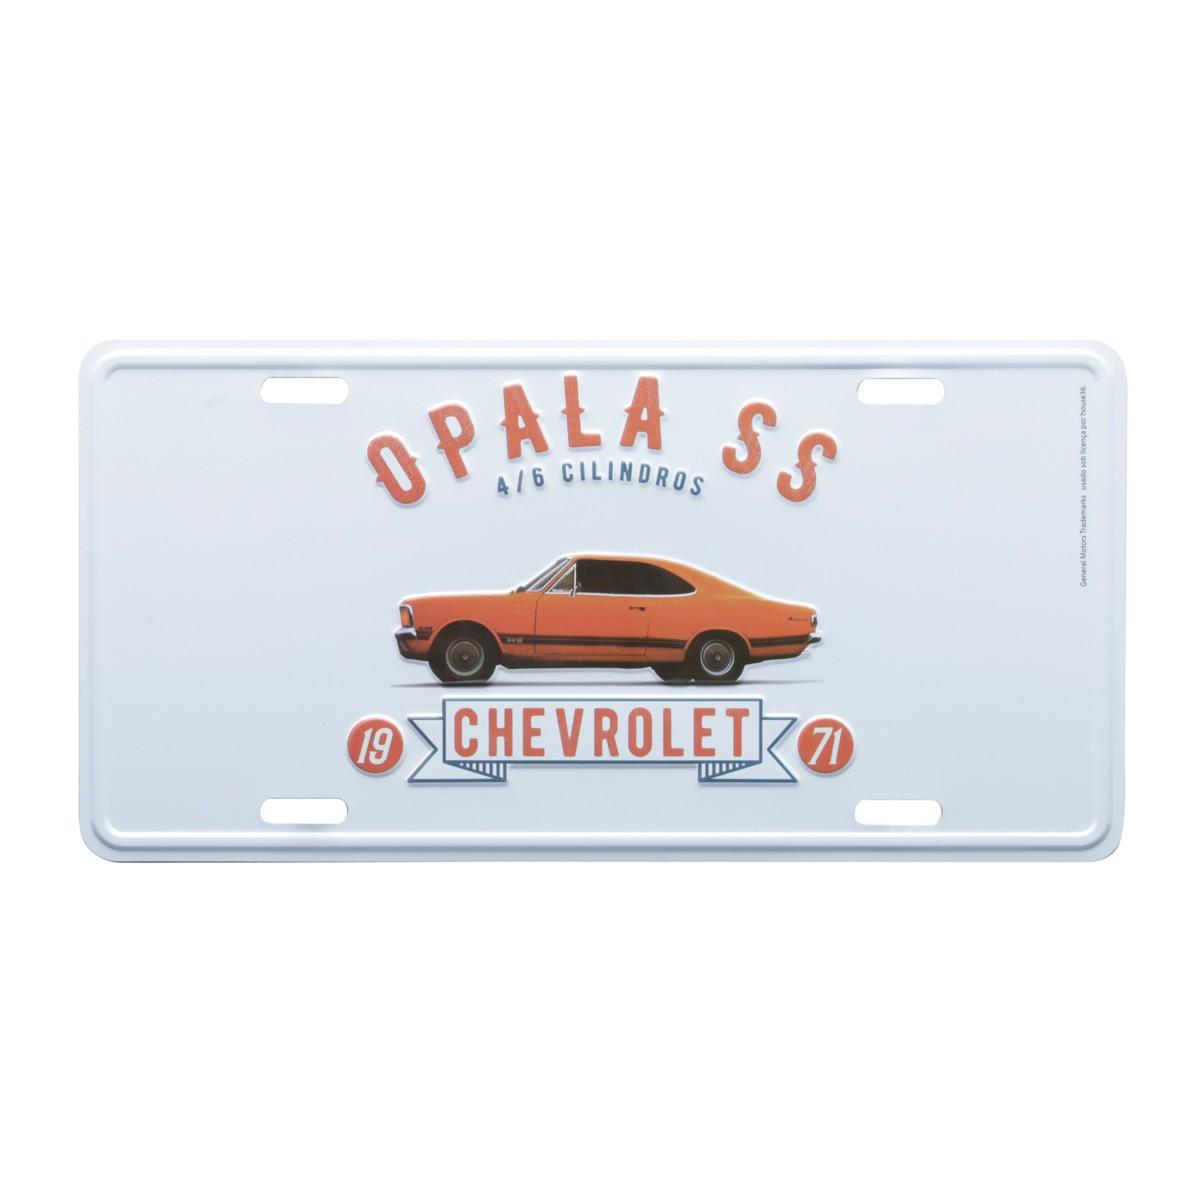 Placa de Alumínio Chevrolet - Opala 1971 - Prata / Laranja